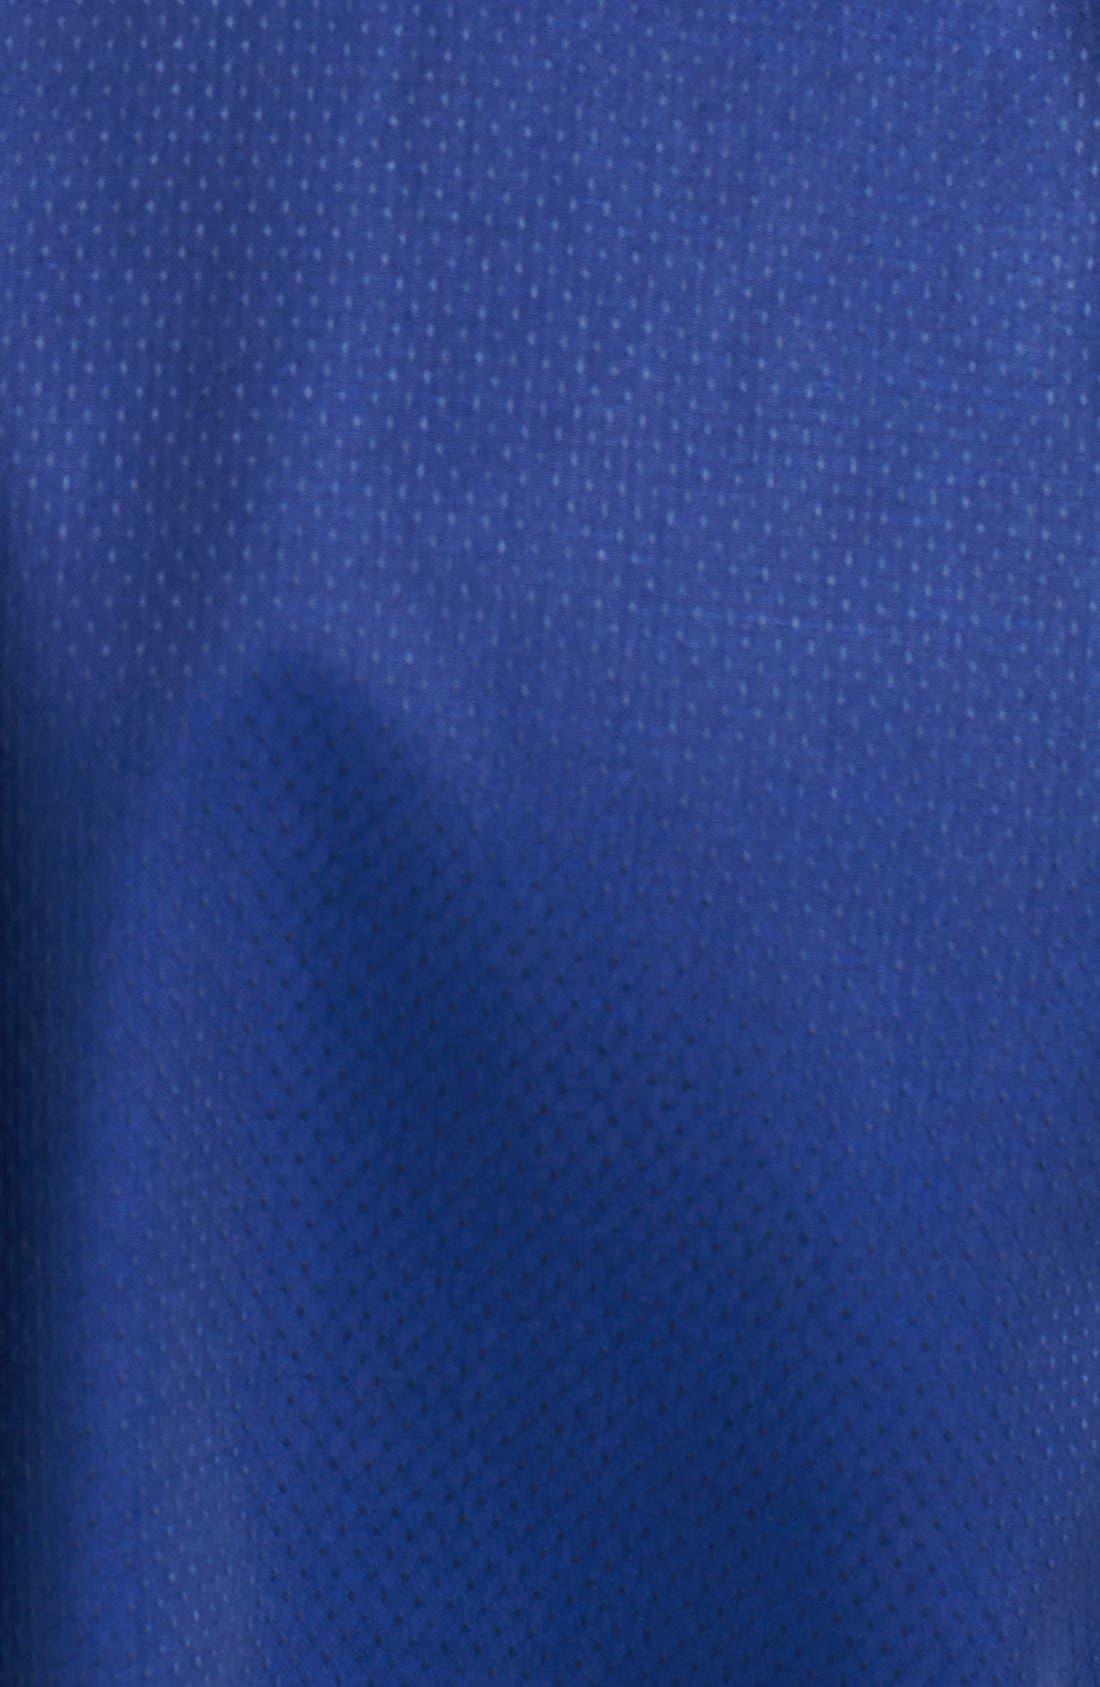 Alternate Image 3  - Paul Smith London Microdot Print Cotton Shirt